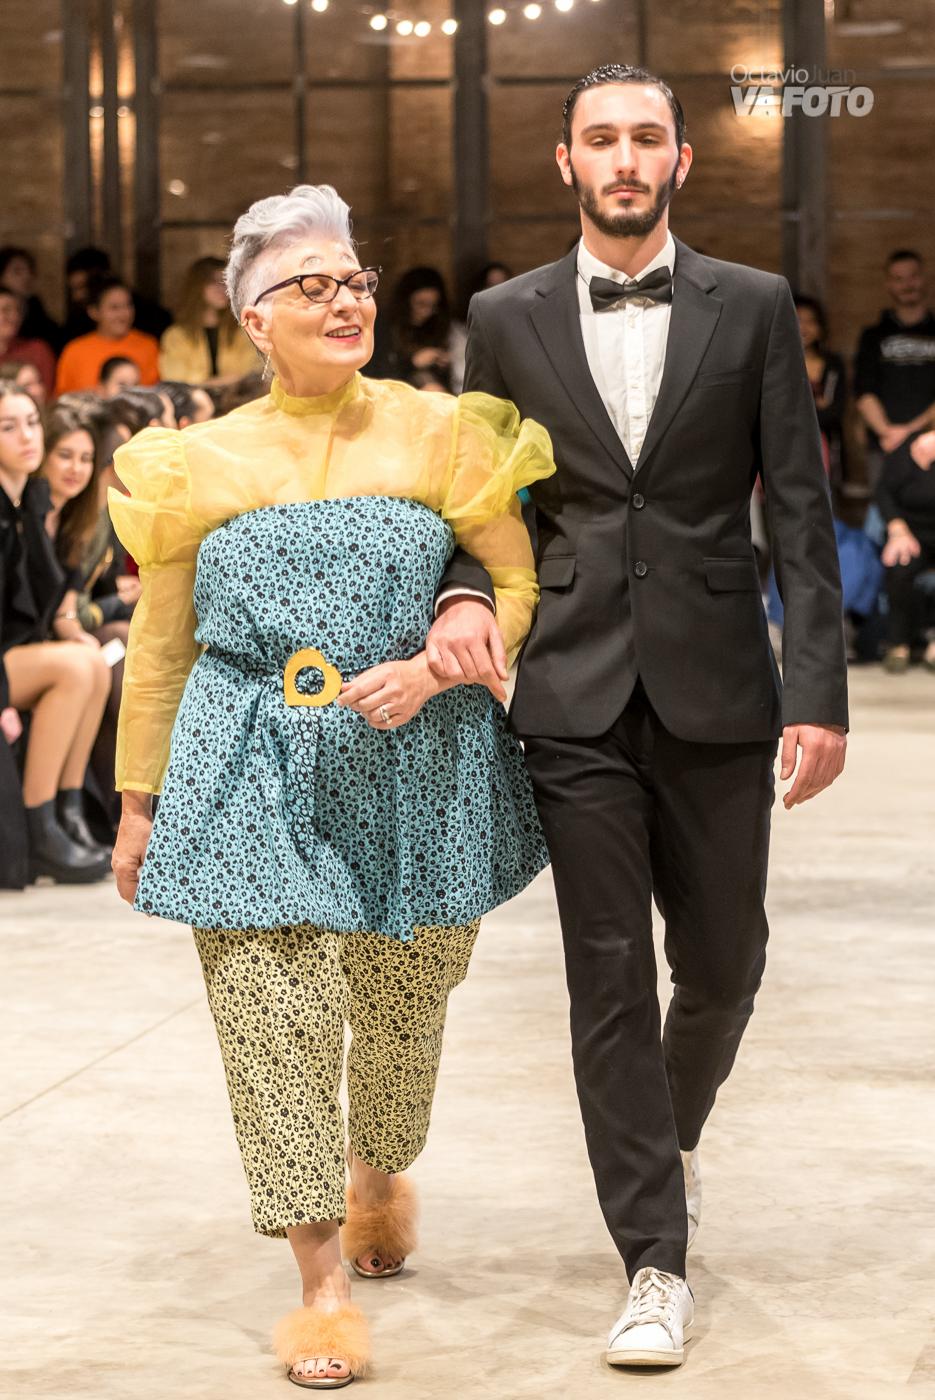 00176 ARTEMODA DSC4275 20181124 - Evento: Arte + Moda Valencia